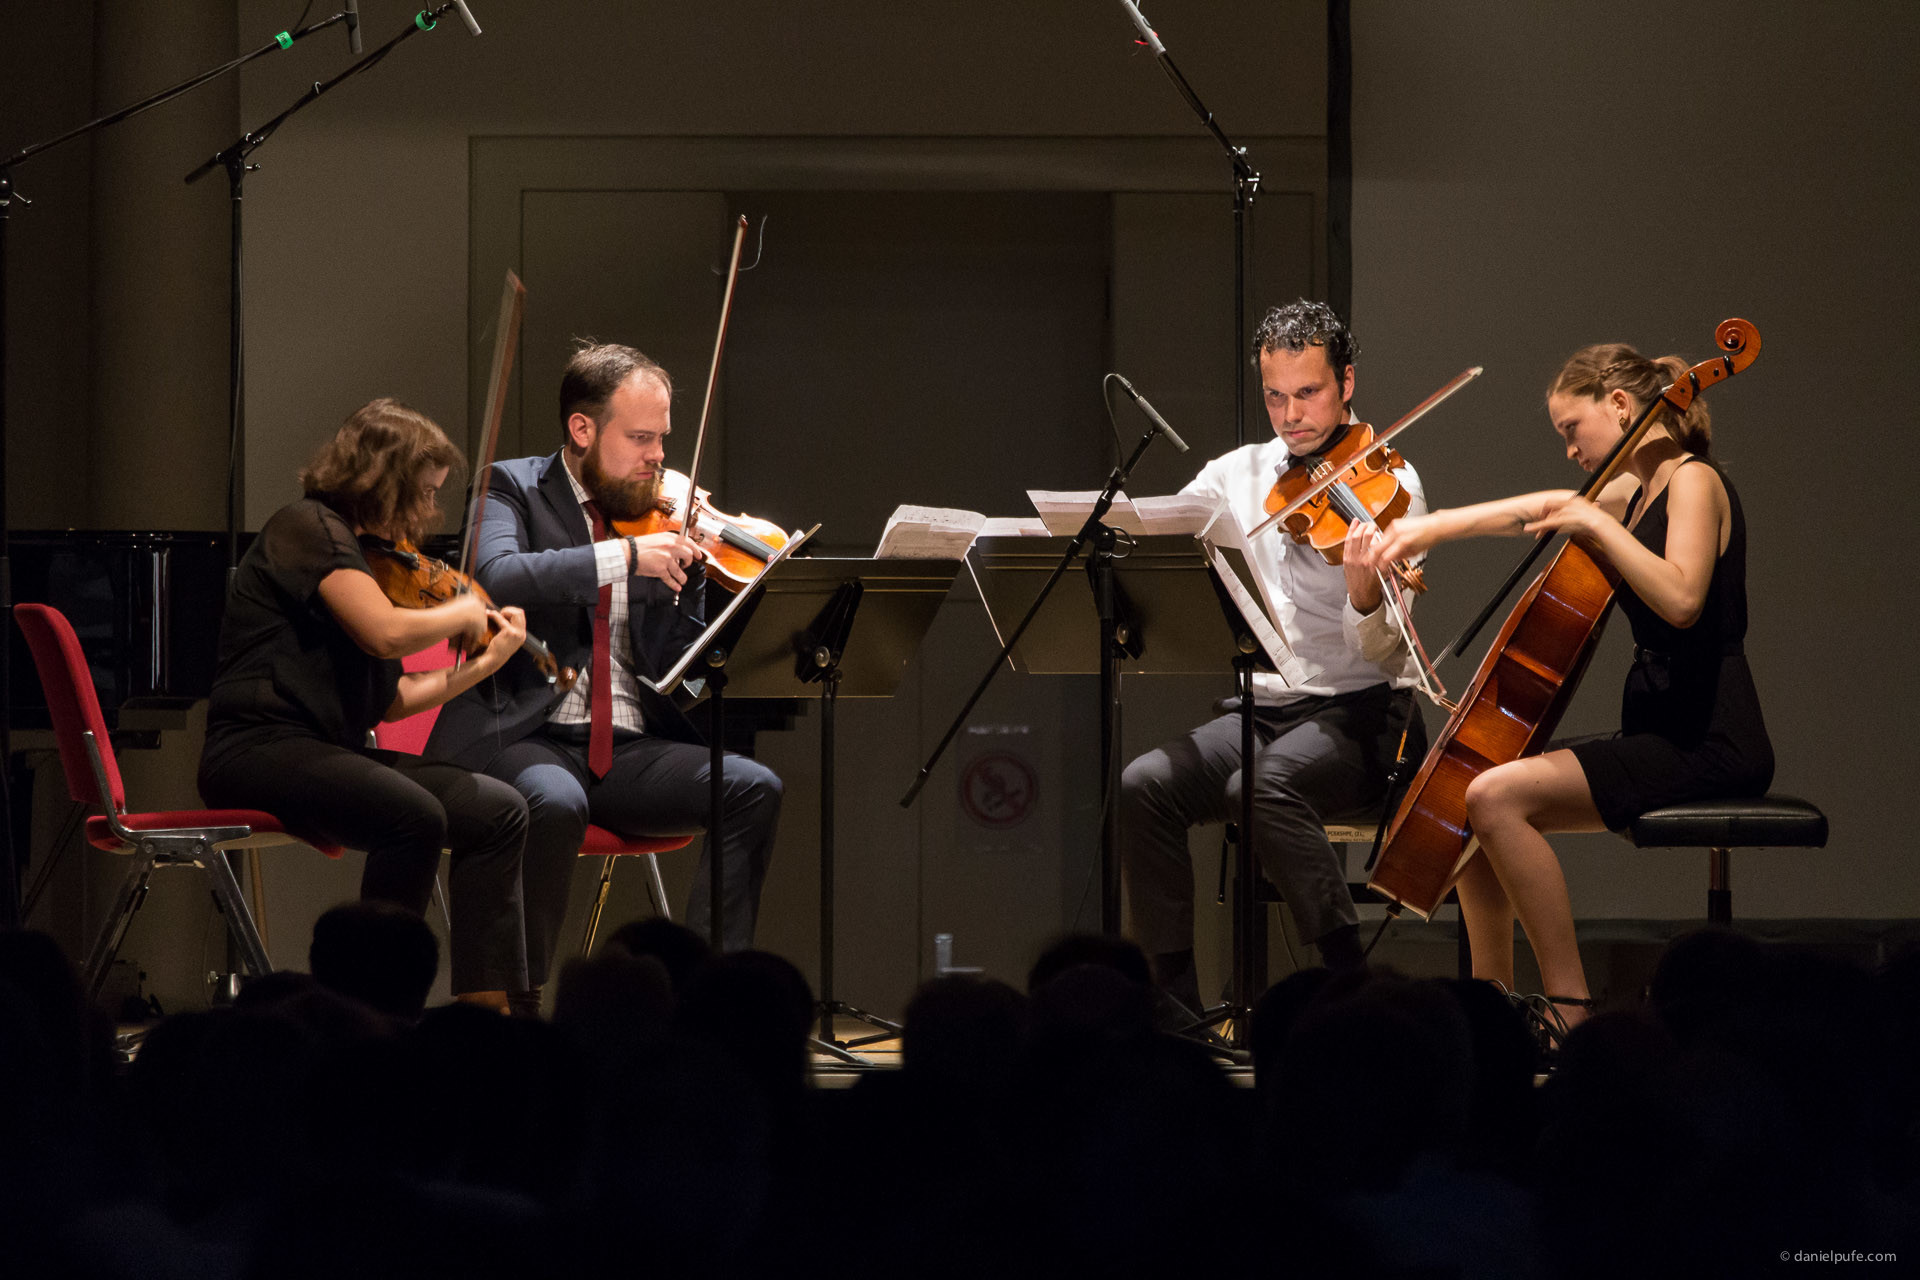 Concert - Showcase I - Mivos - Orangerie